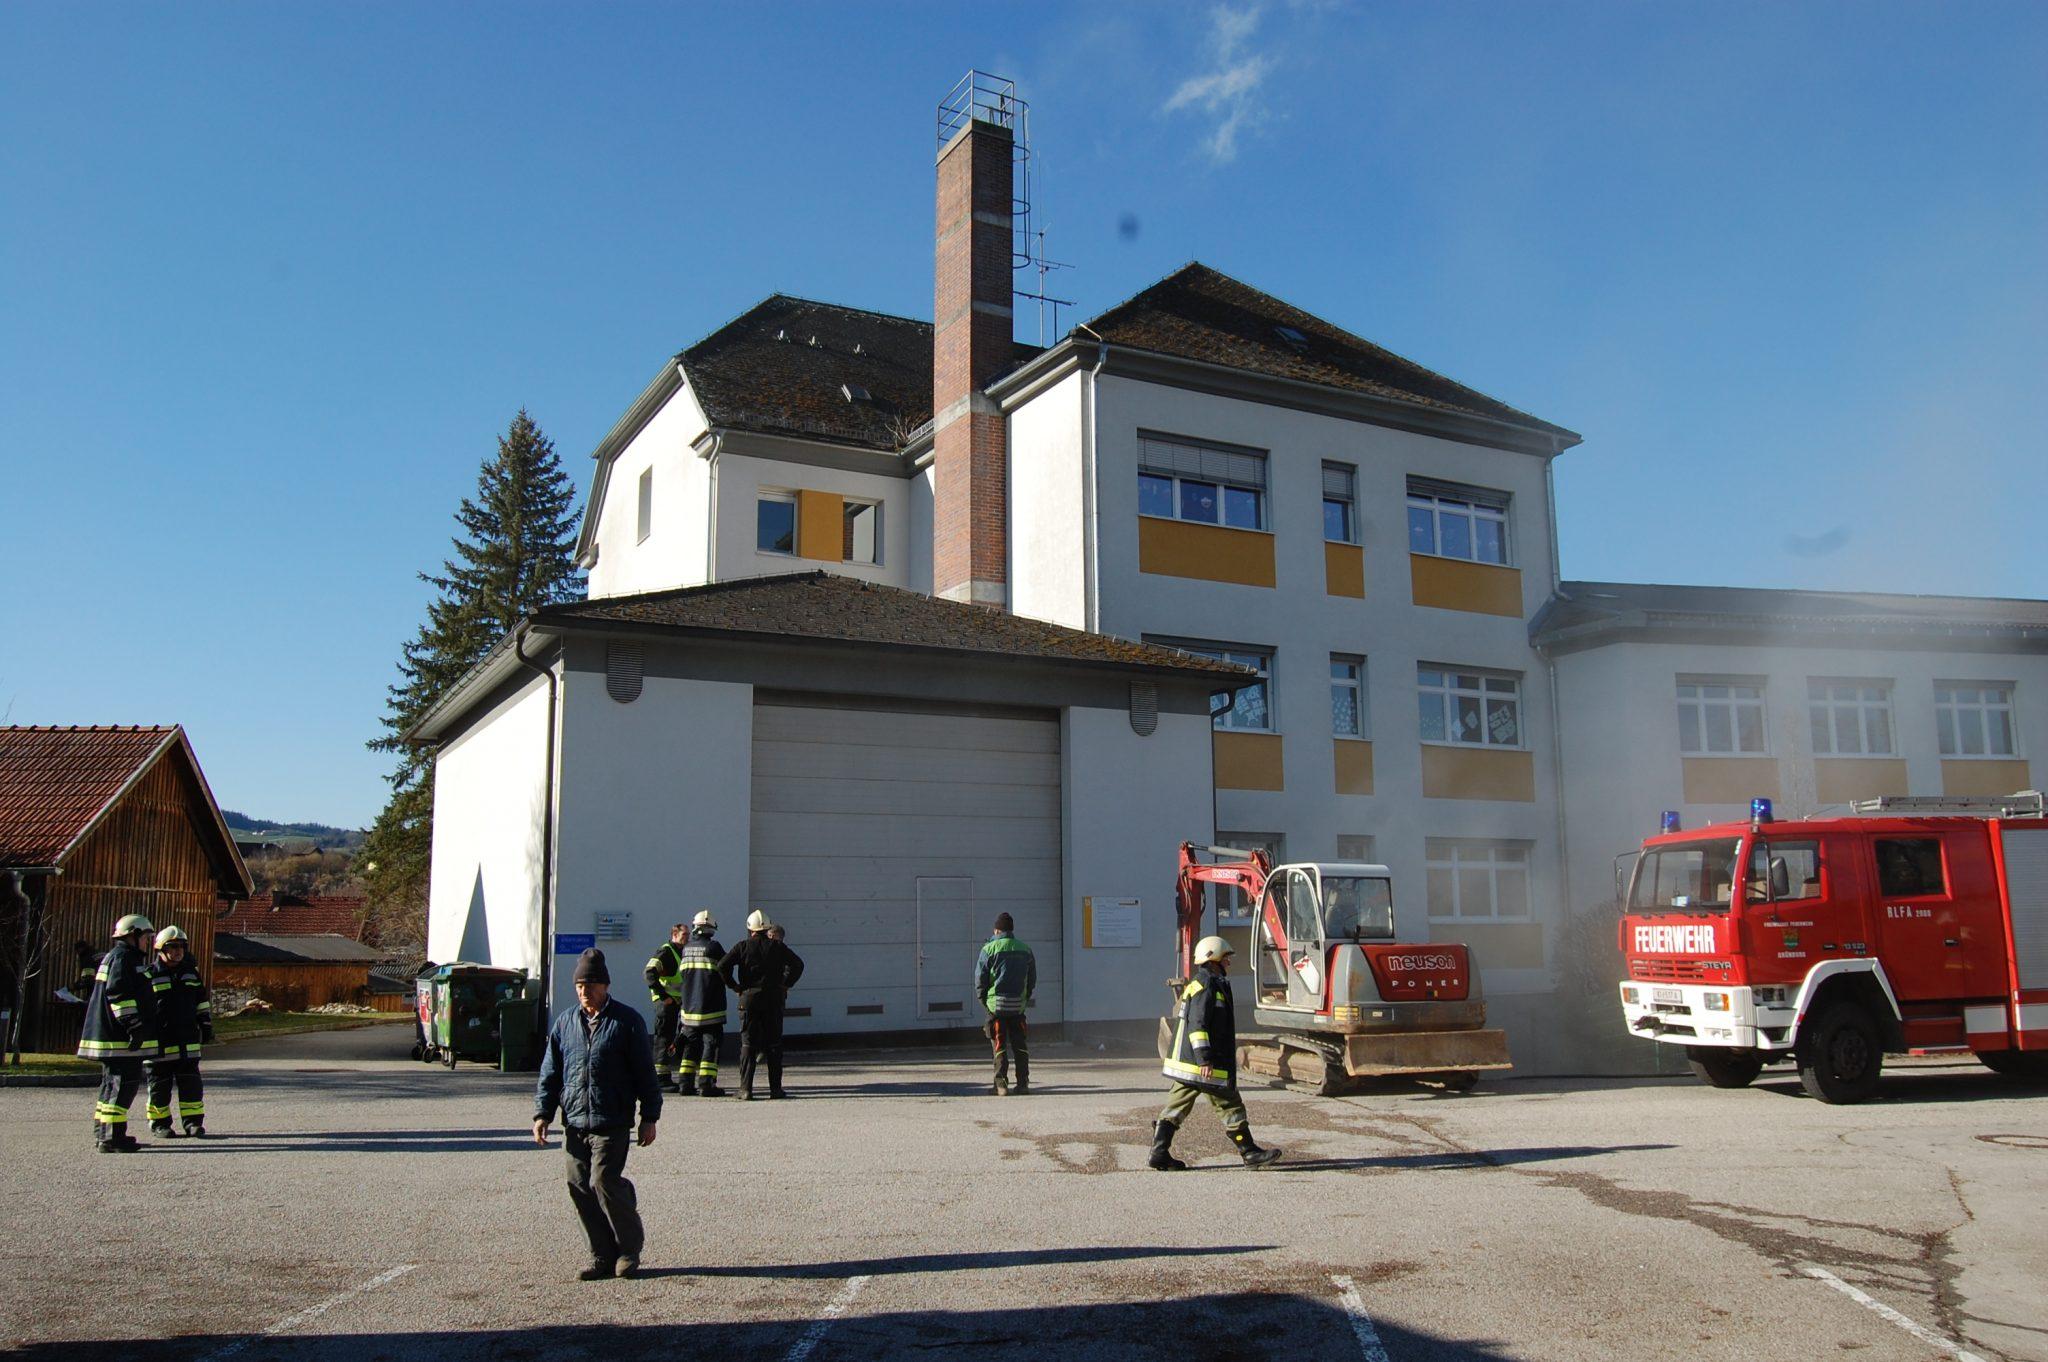 Brand Hackschnitzelheizung Volksschule Steinbach